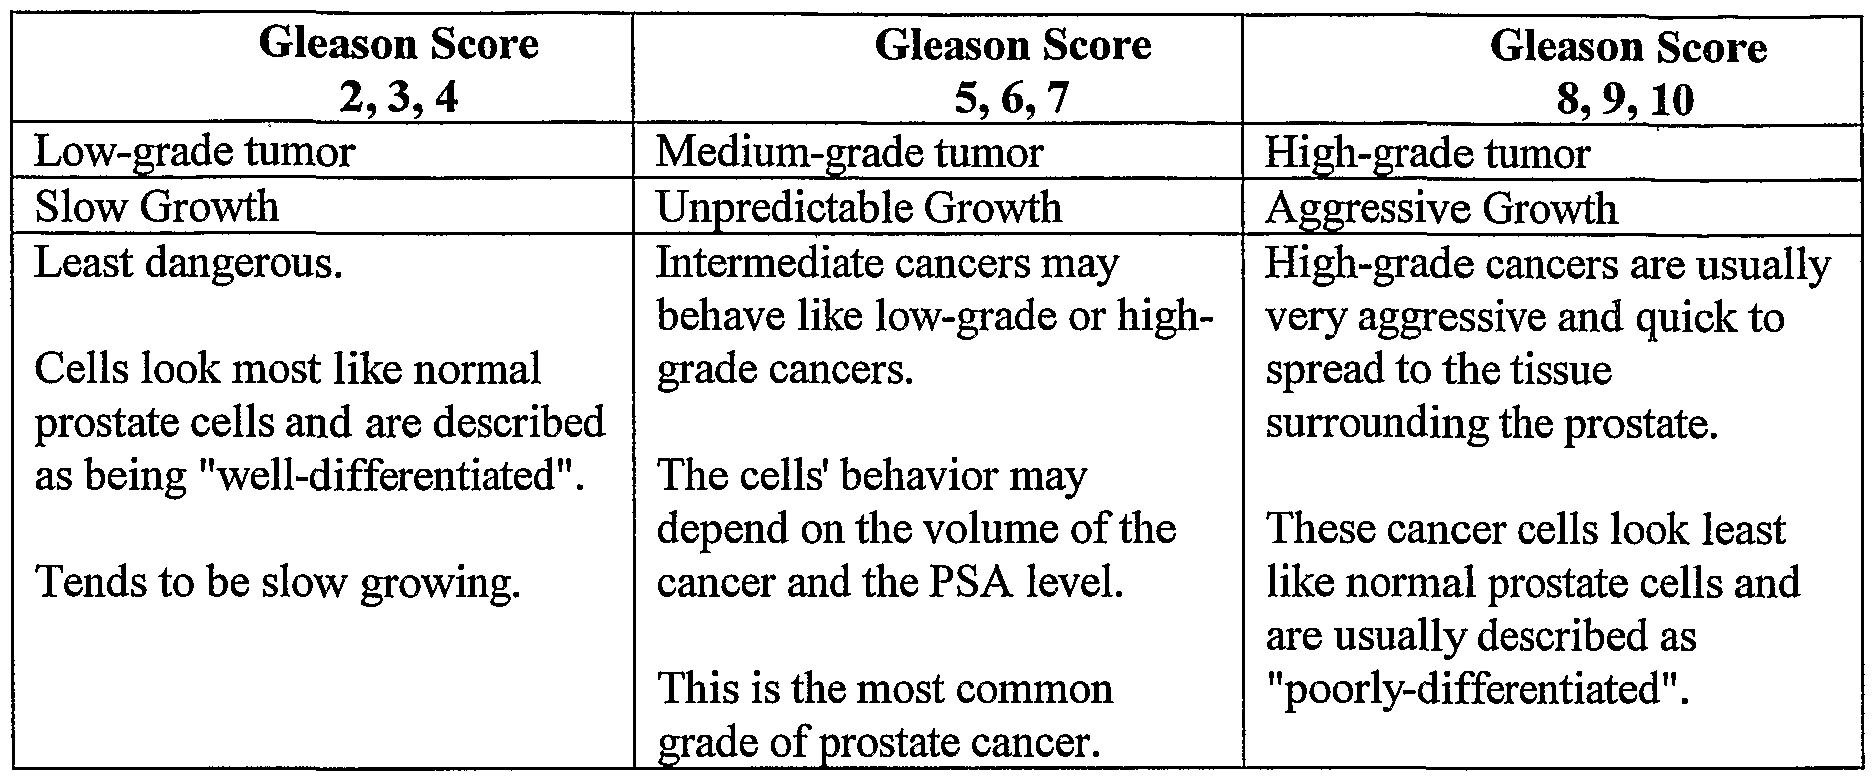 gleason 7 prostate cancer prognosis